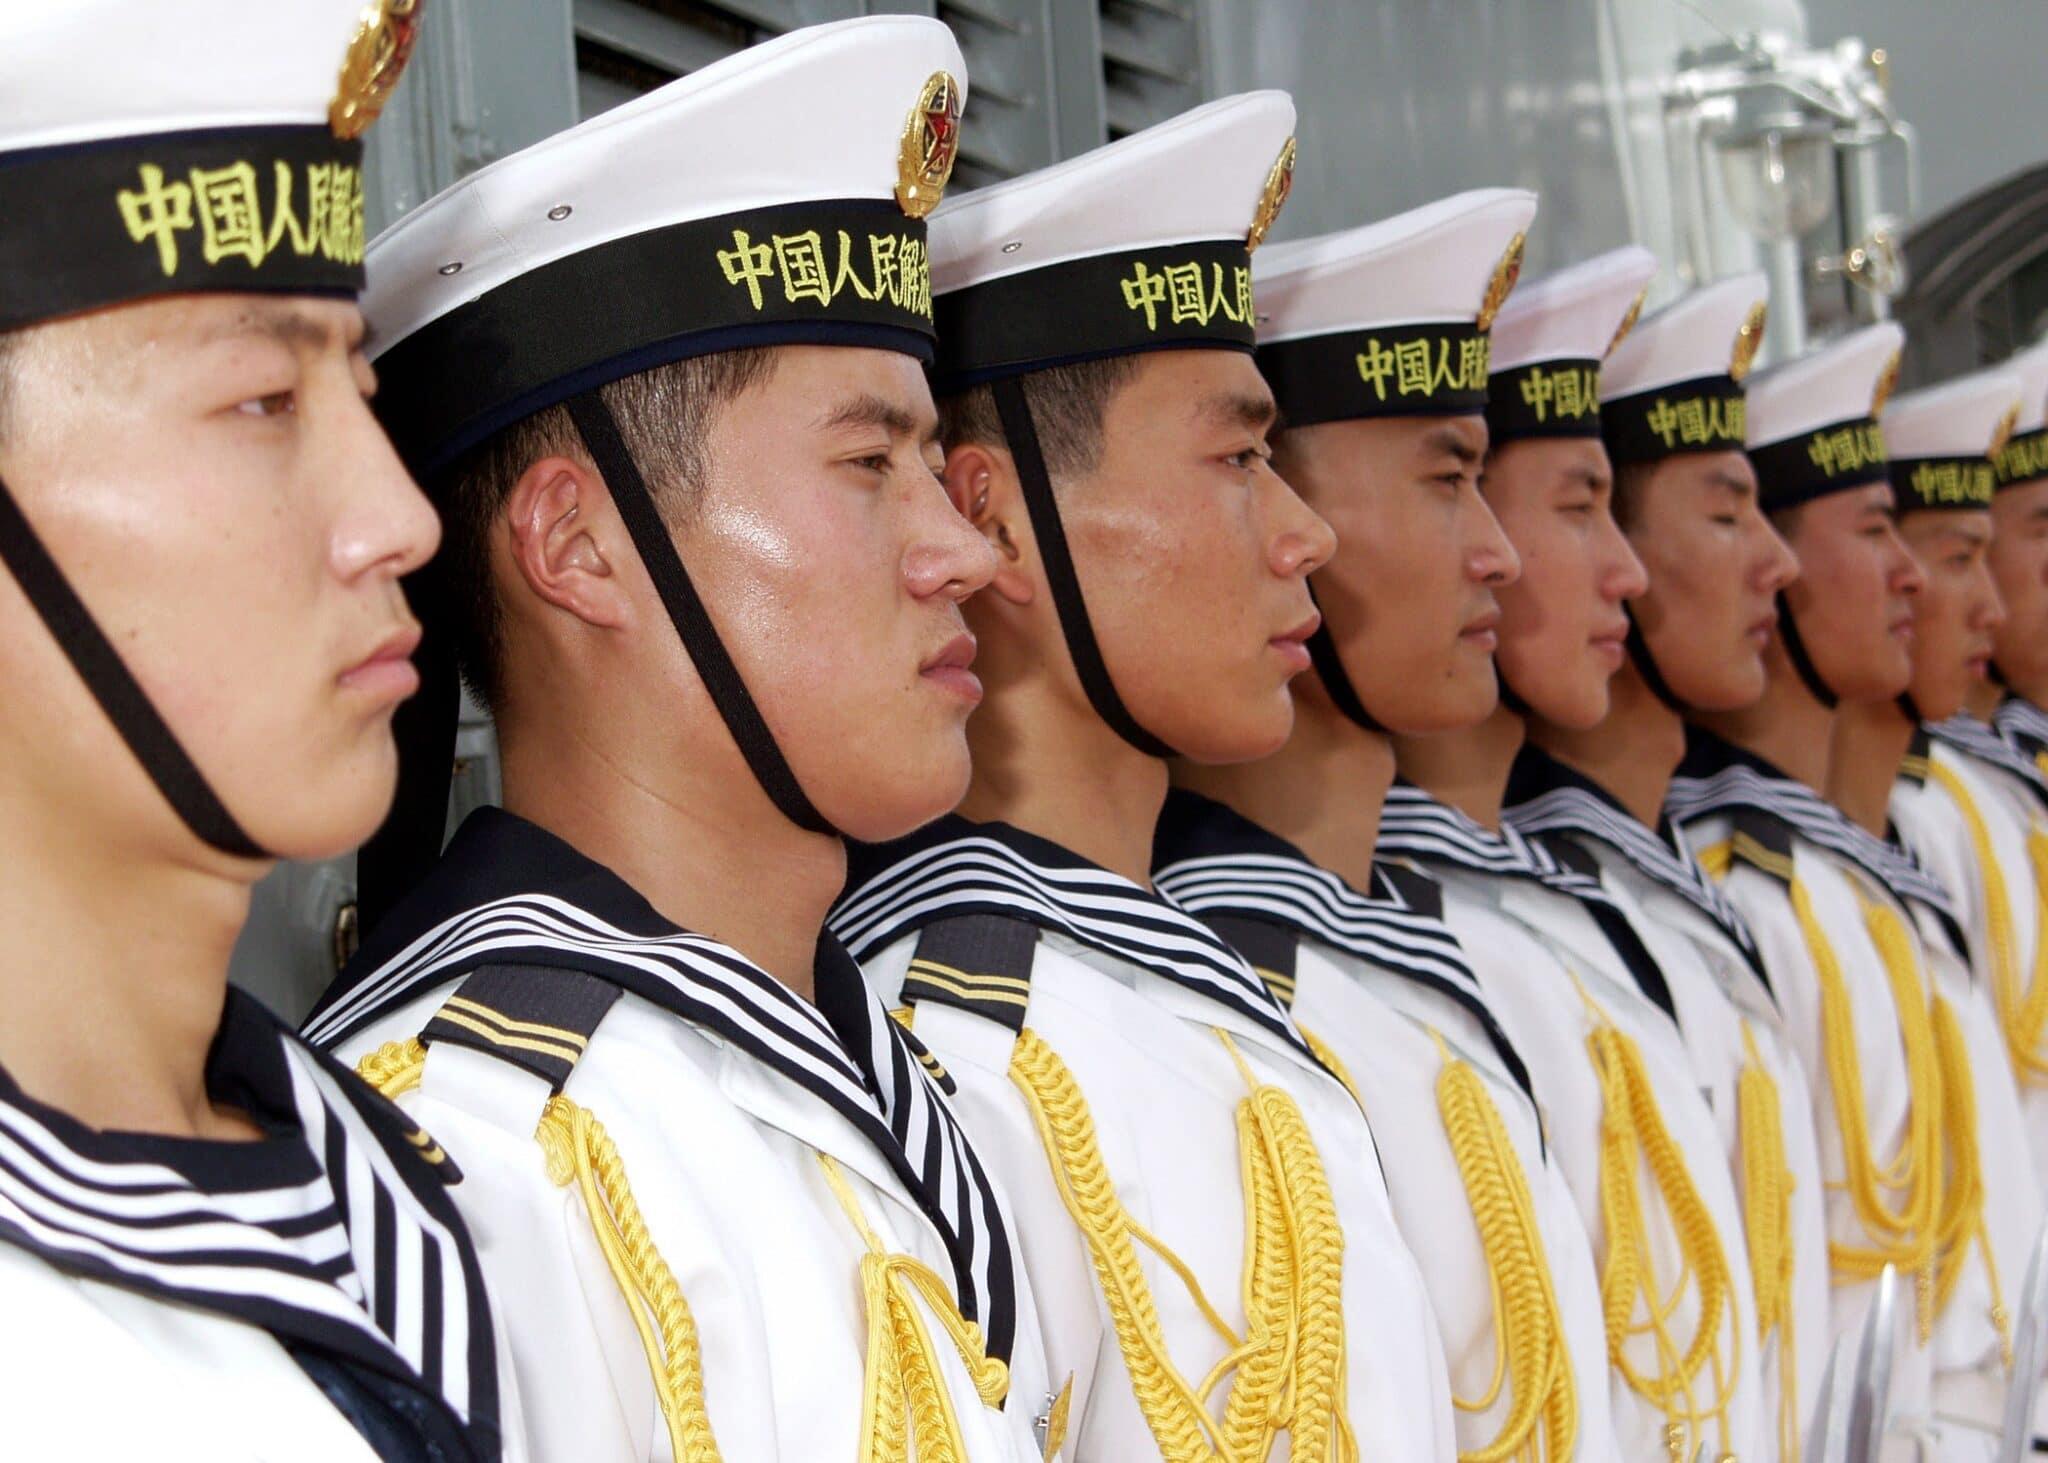 L'Esercito cinese da armata contadina a forza globale